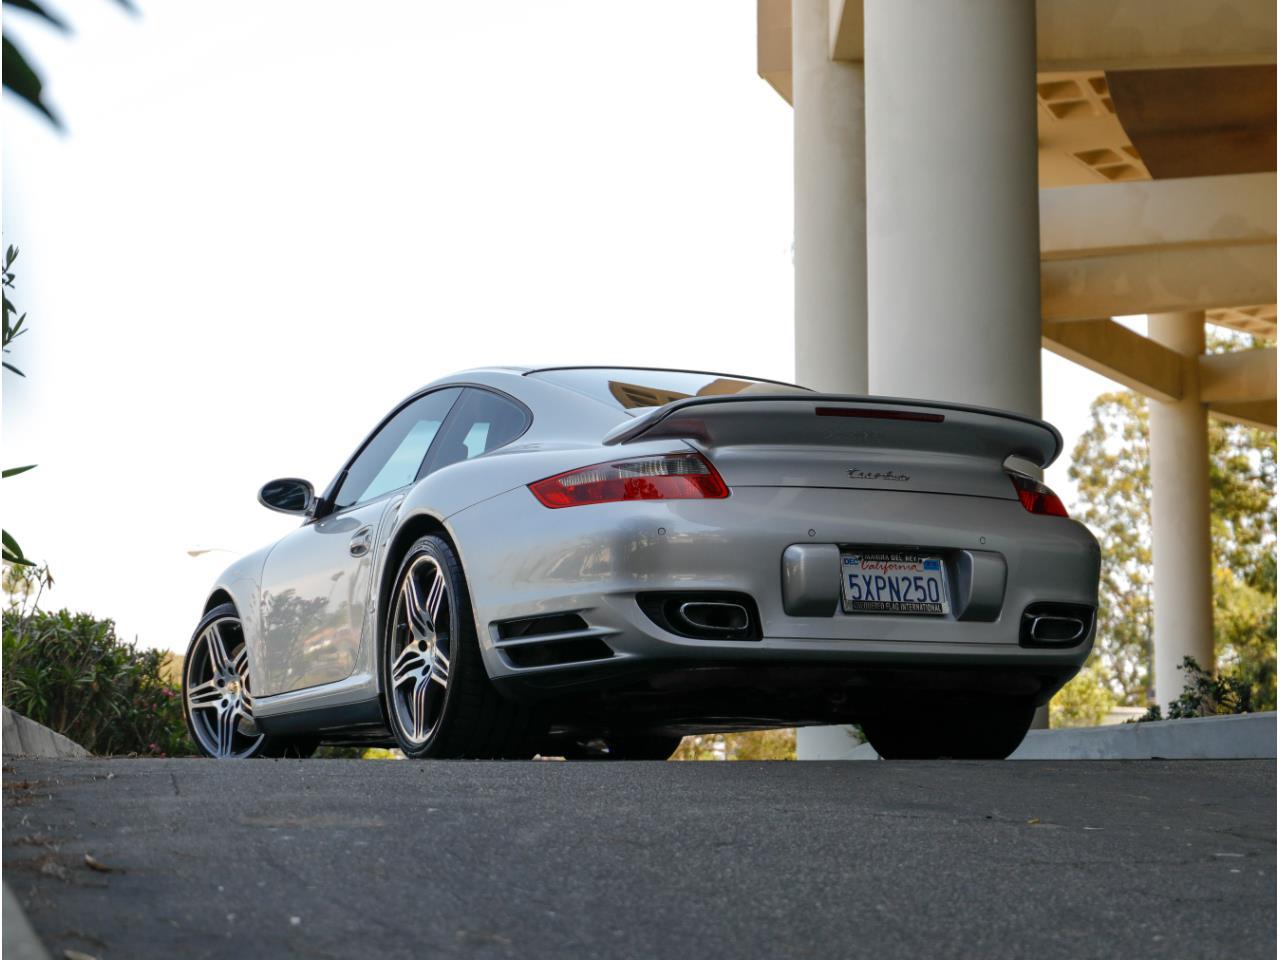 Large Picture of '07 Porsche 911 Turbo located in Marina Del Rey California - $71,500.00 - QG8Z